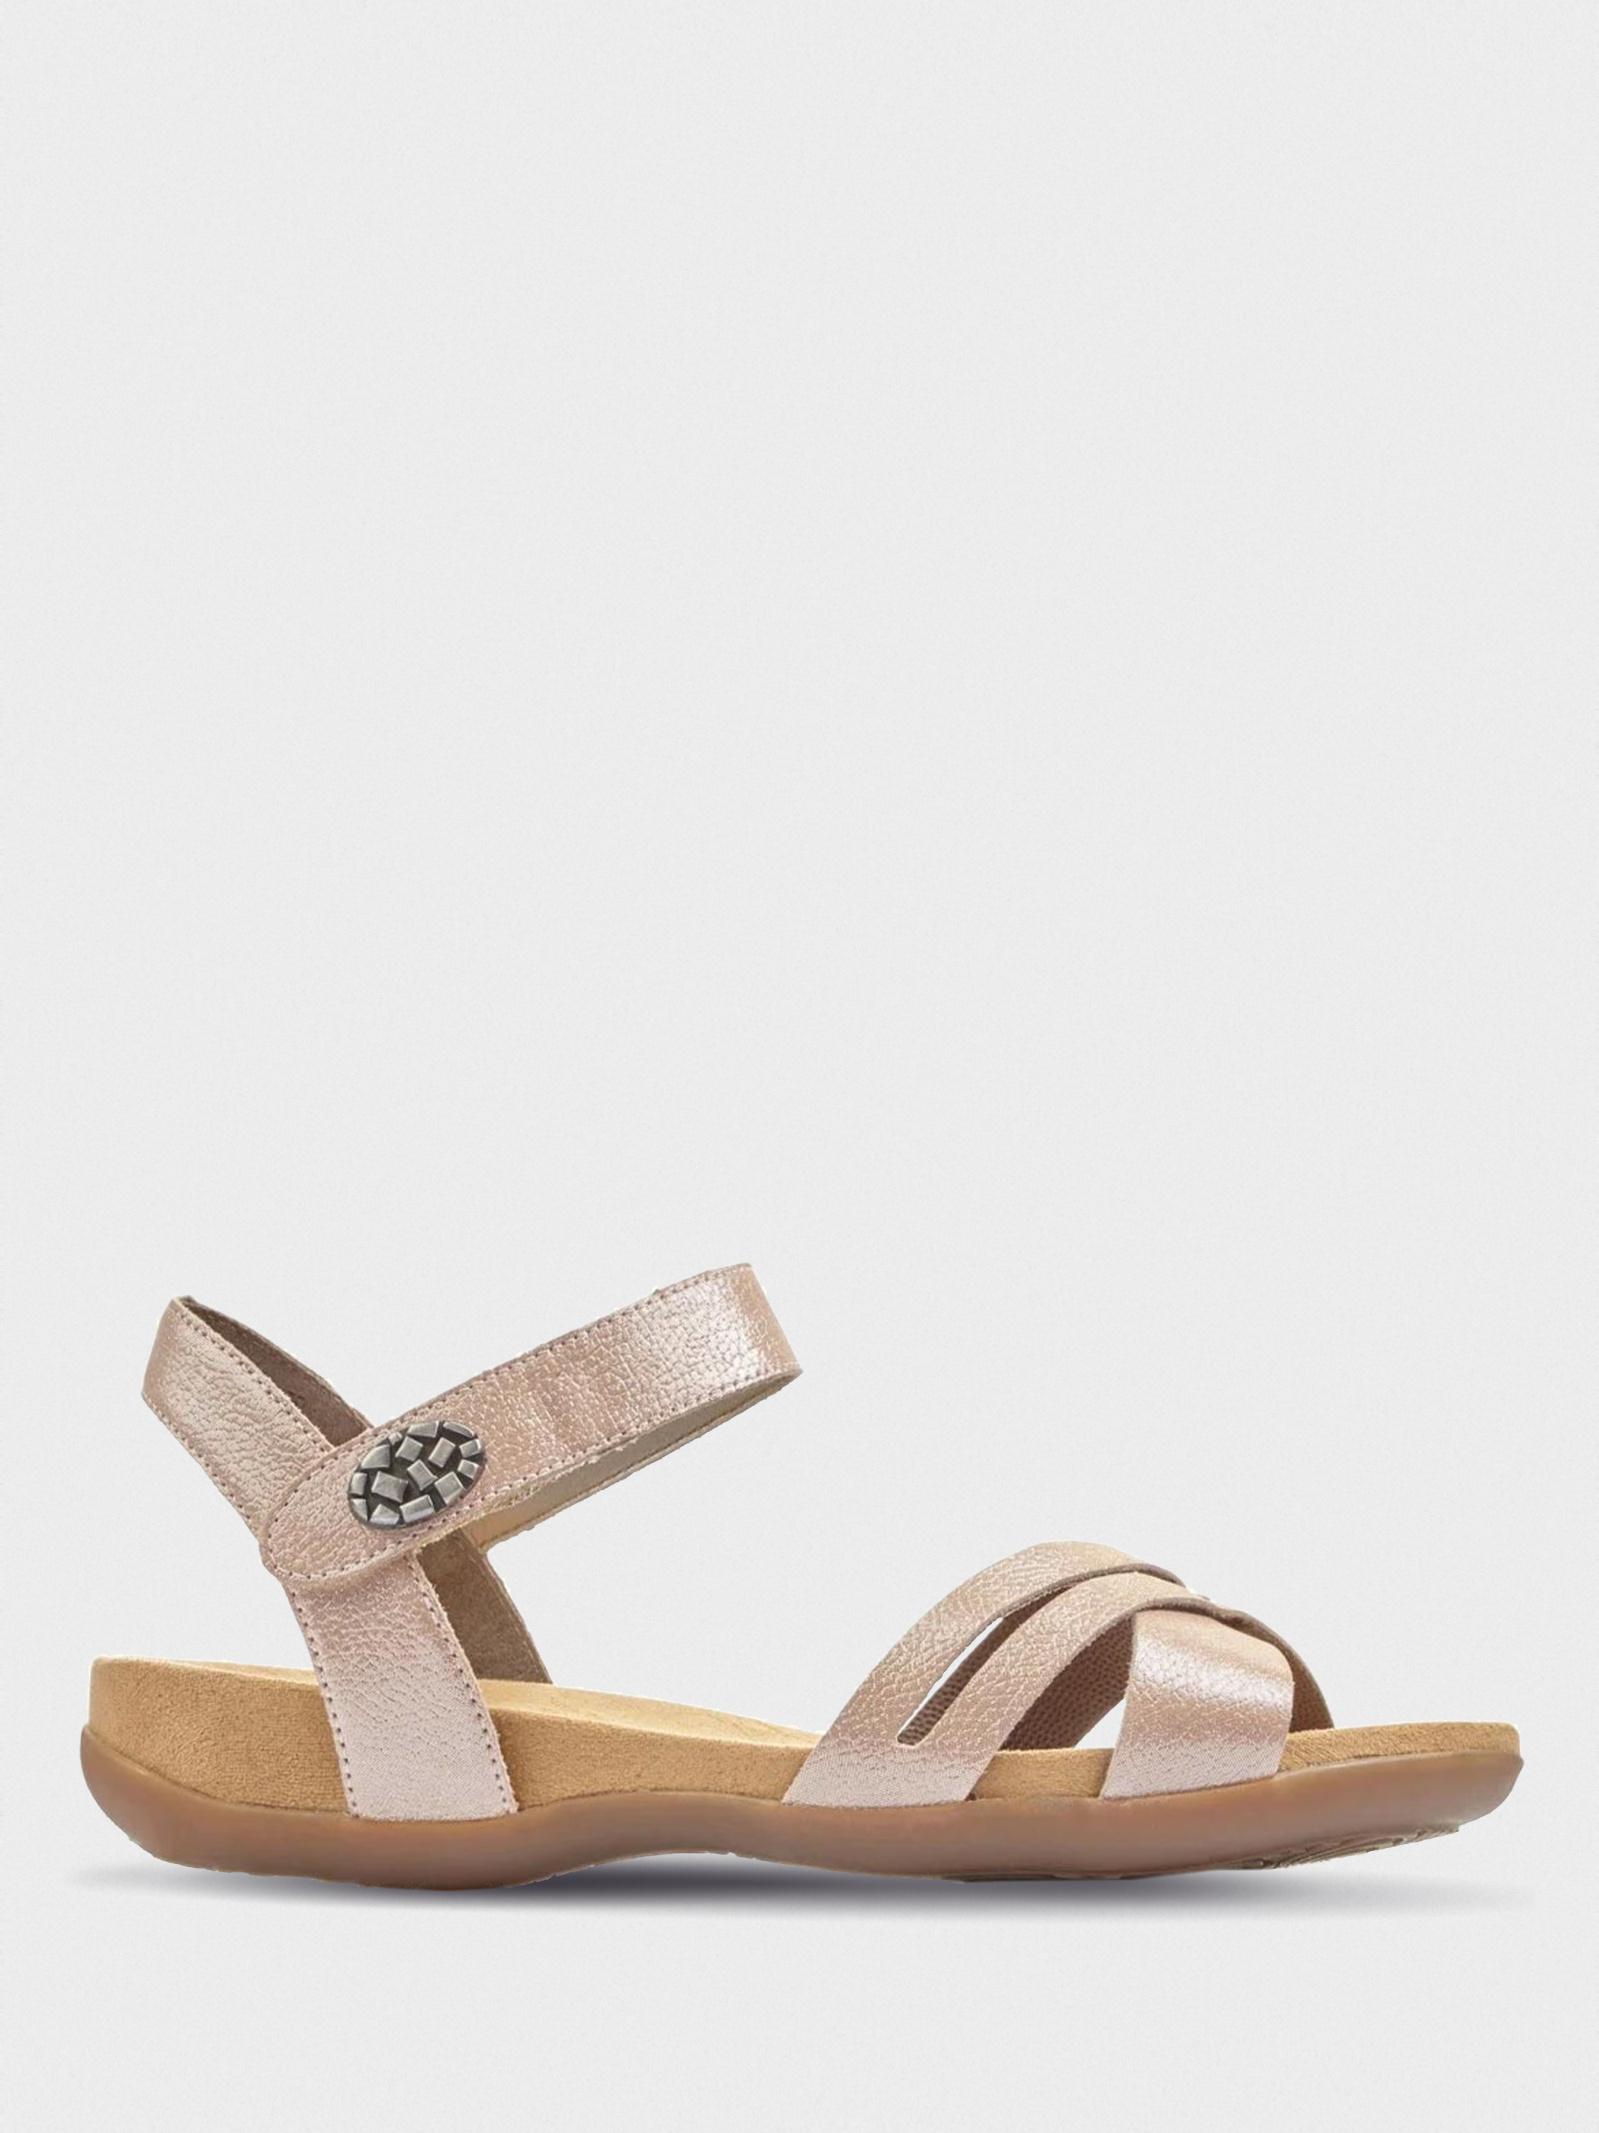 Сандалии для женщин RIEKER 60553/31 размеры обуви, 2017